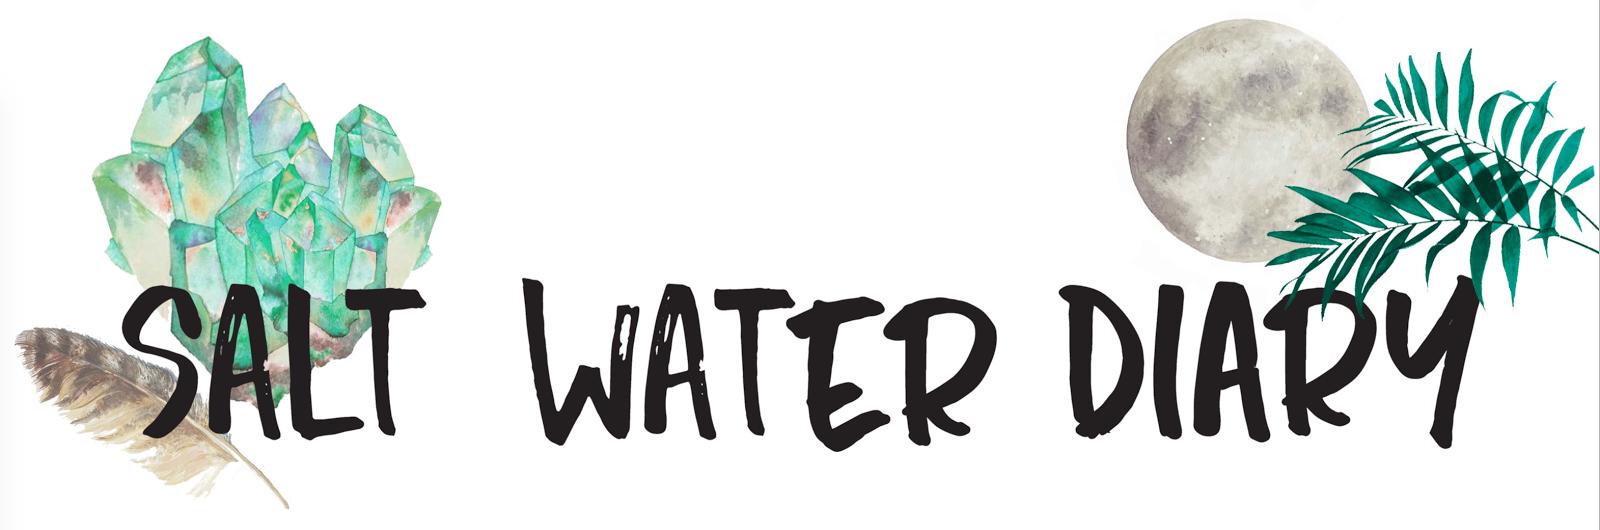 Salt Water Diary